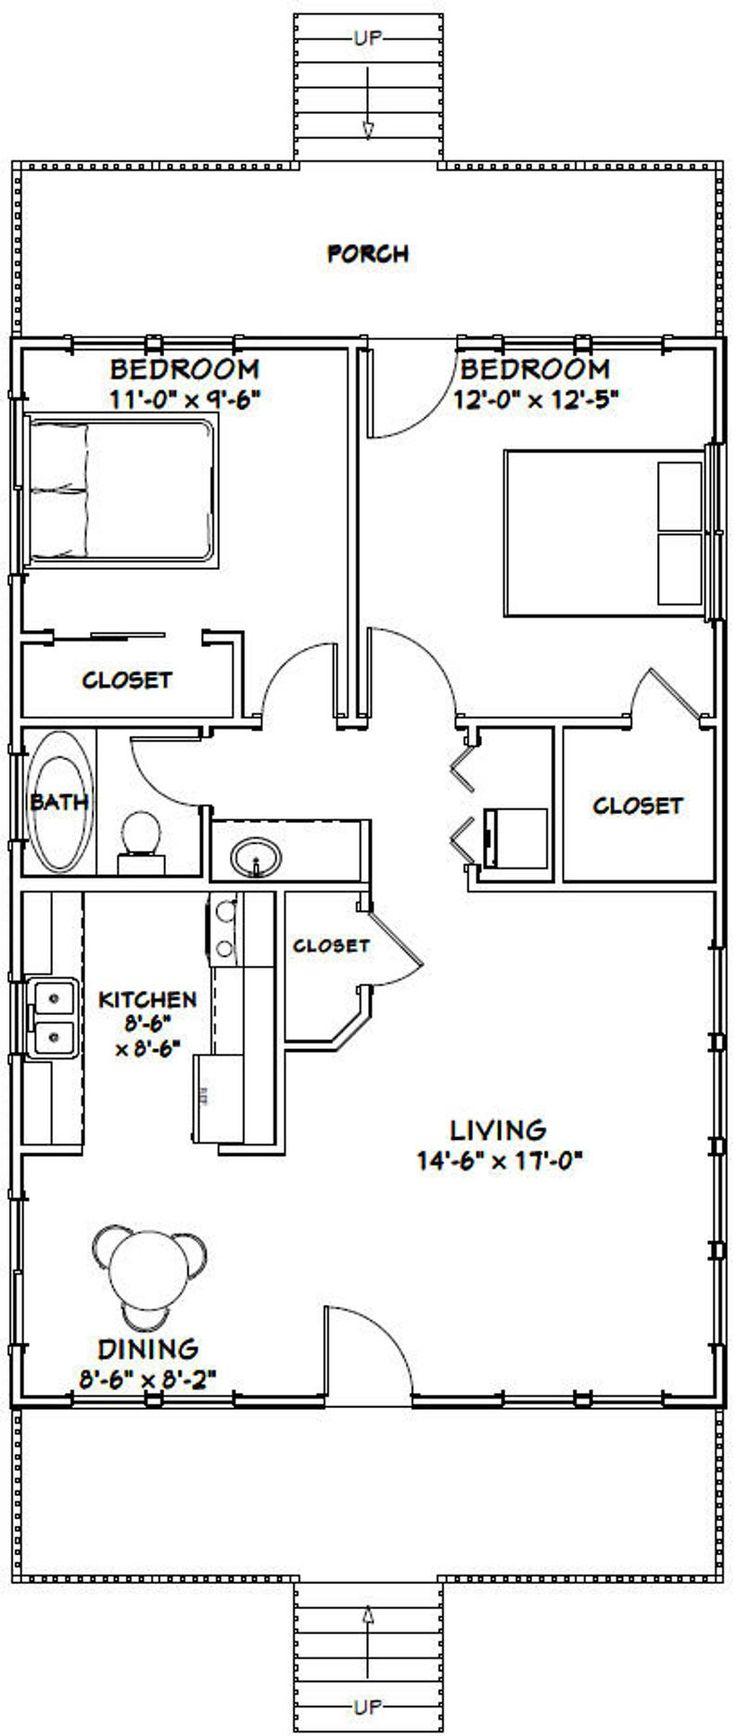 24x36 House 2Bedroom 1Bath 864 sq ft PDF Floor Plan